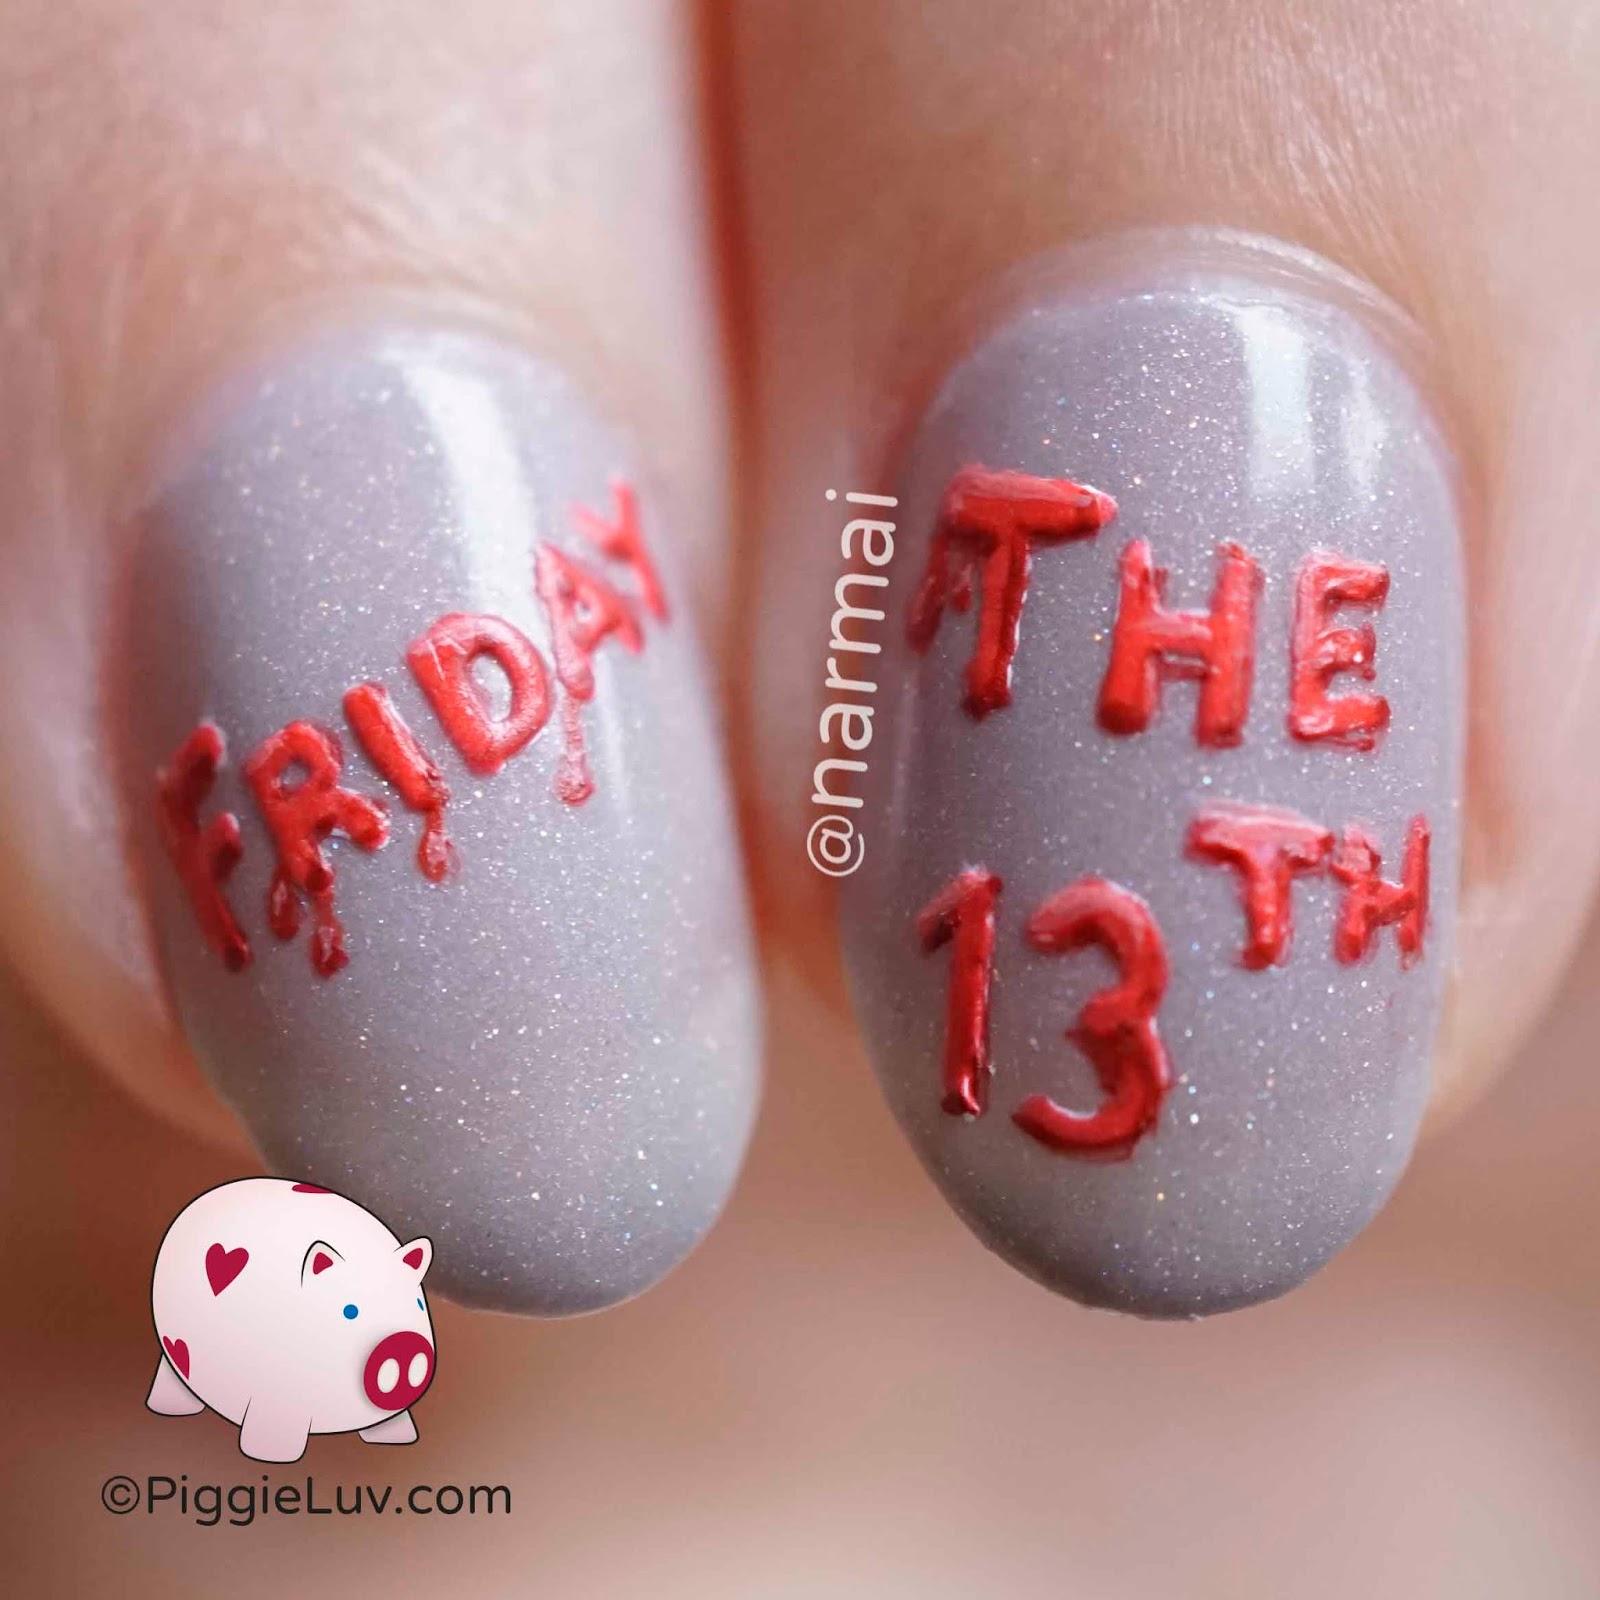 Piggieluv Happy Friday The 13th